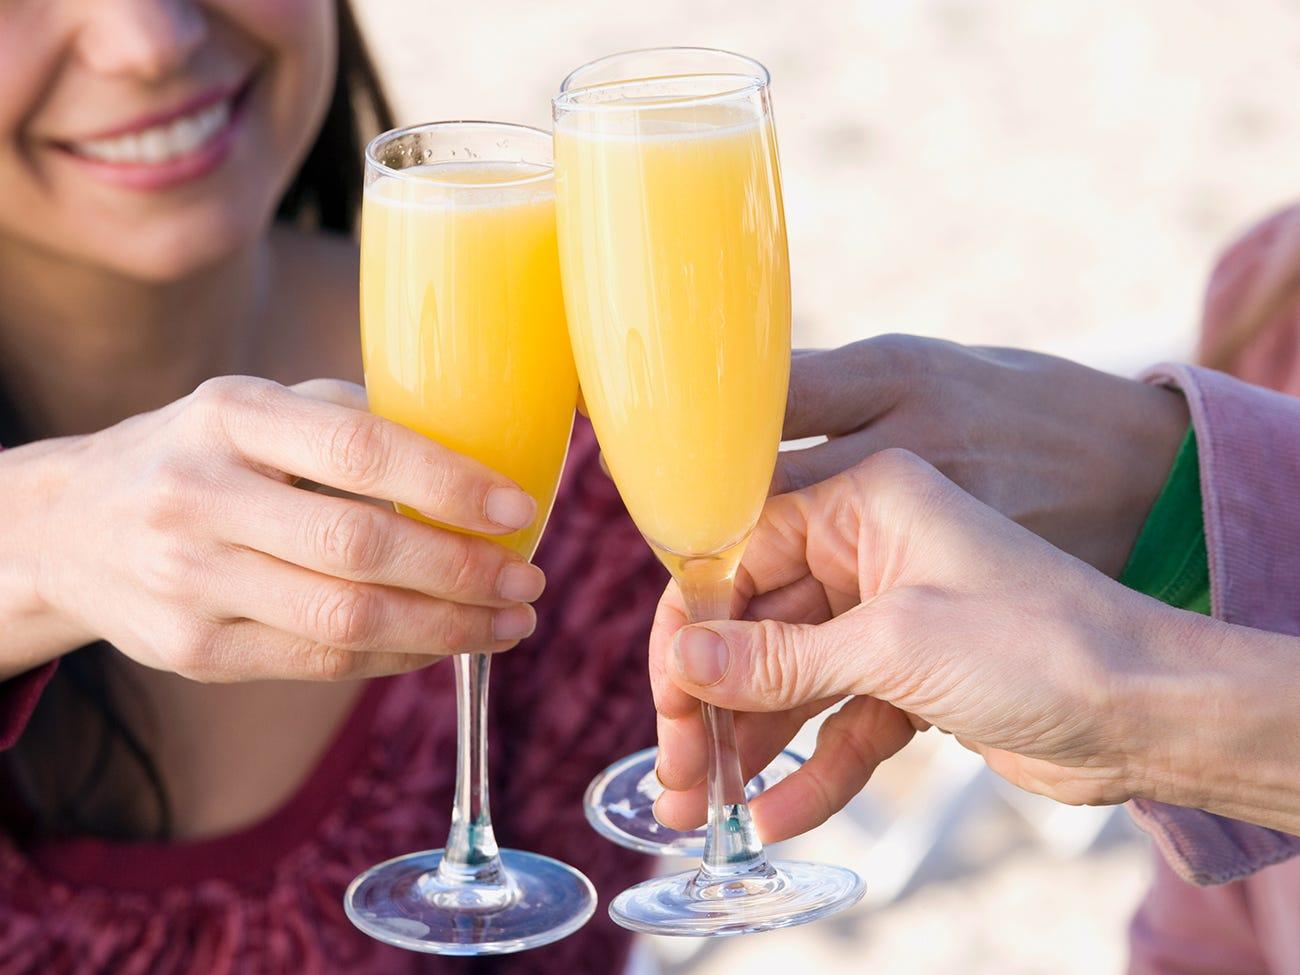 Personnes trinquant avec des verres de mimosa